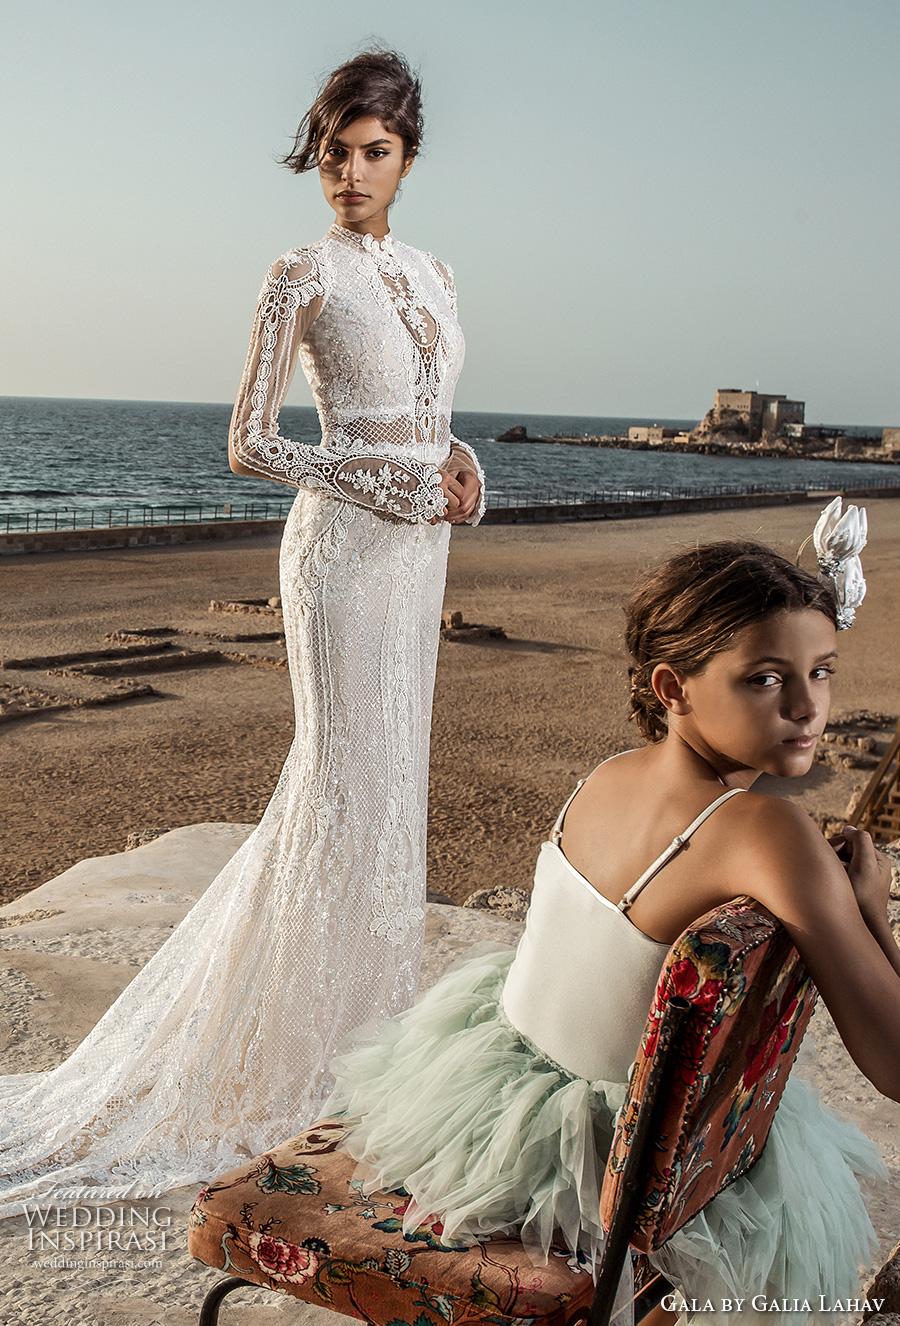 Gala By Galia Lahav 2017 Wedding Dresses Crazyforus - Galia Lahav Wedding Dresses